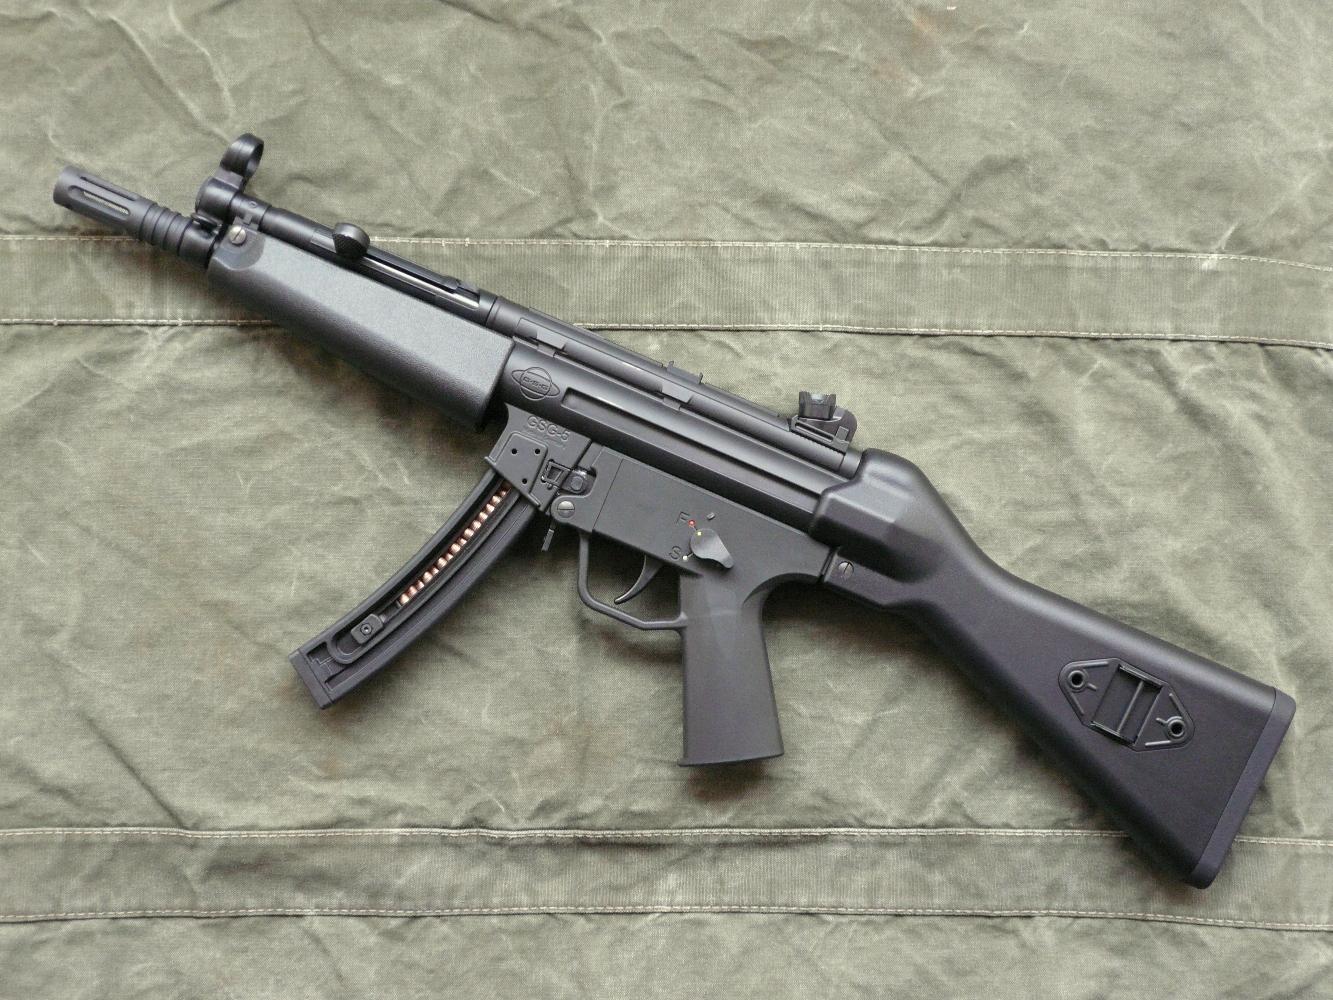 essai armes carabine gsg 5 a1 copie hk mp5 calibre 22 long rifle. Black Bedroom Furniture Sets. Home Design Ideas